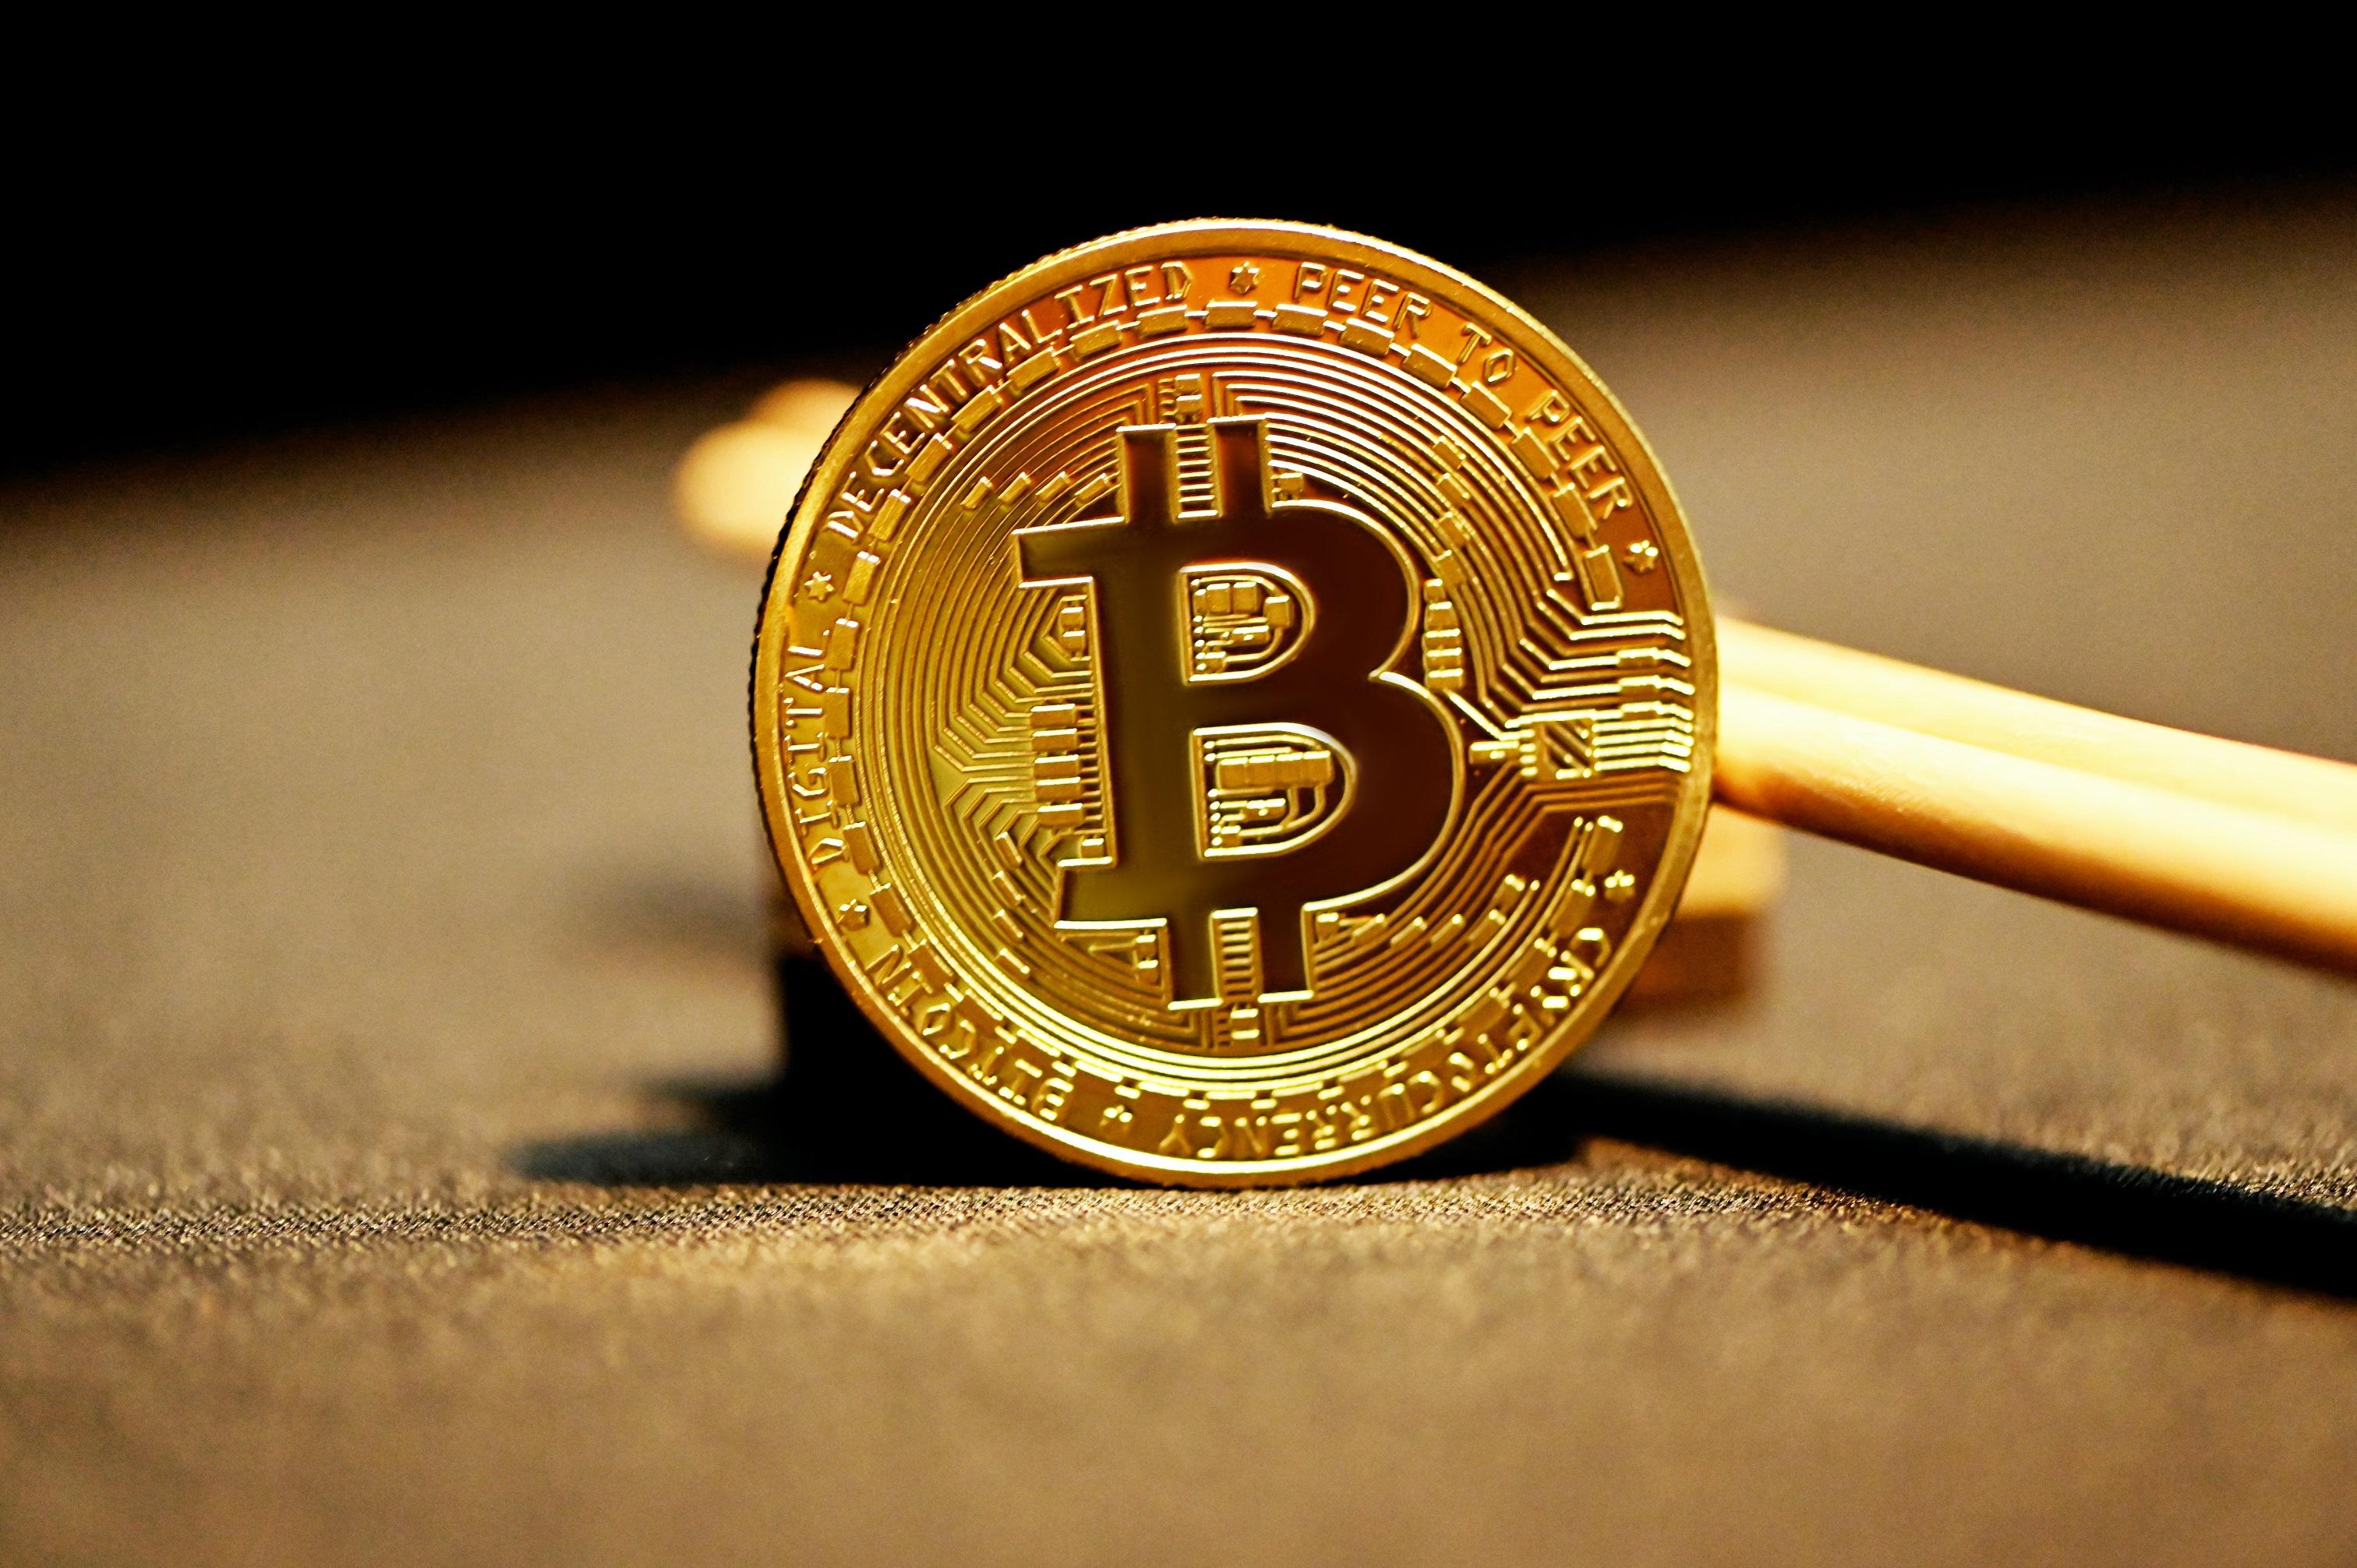 Plan B: The Next 6 Months Will Make Or Break Famed Bitcoin Model